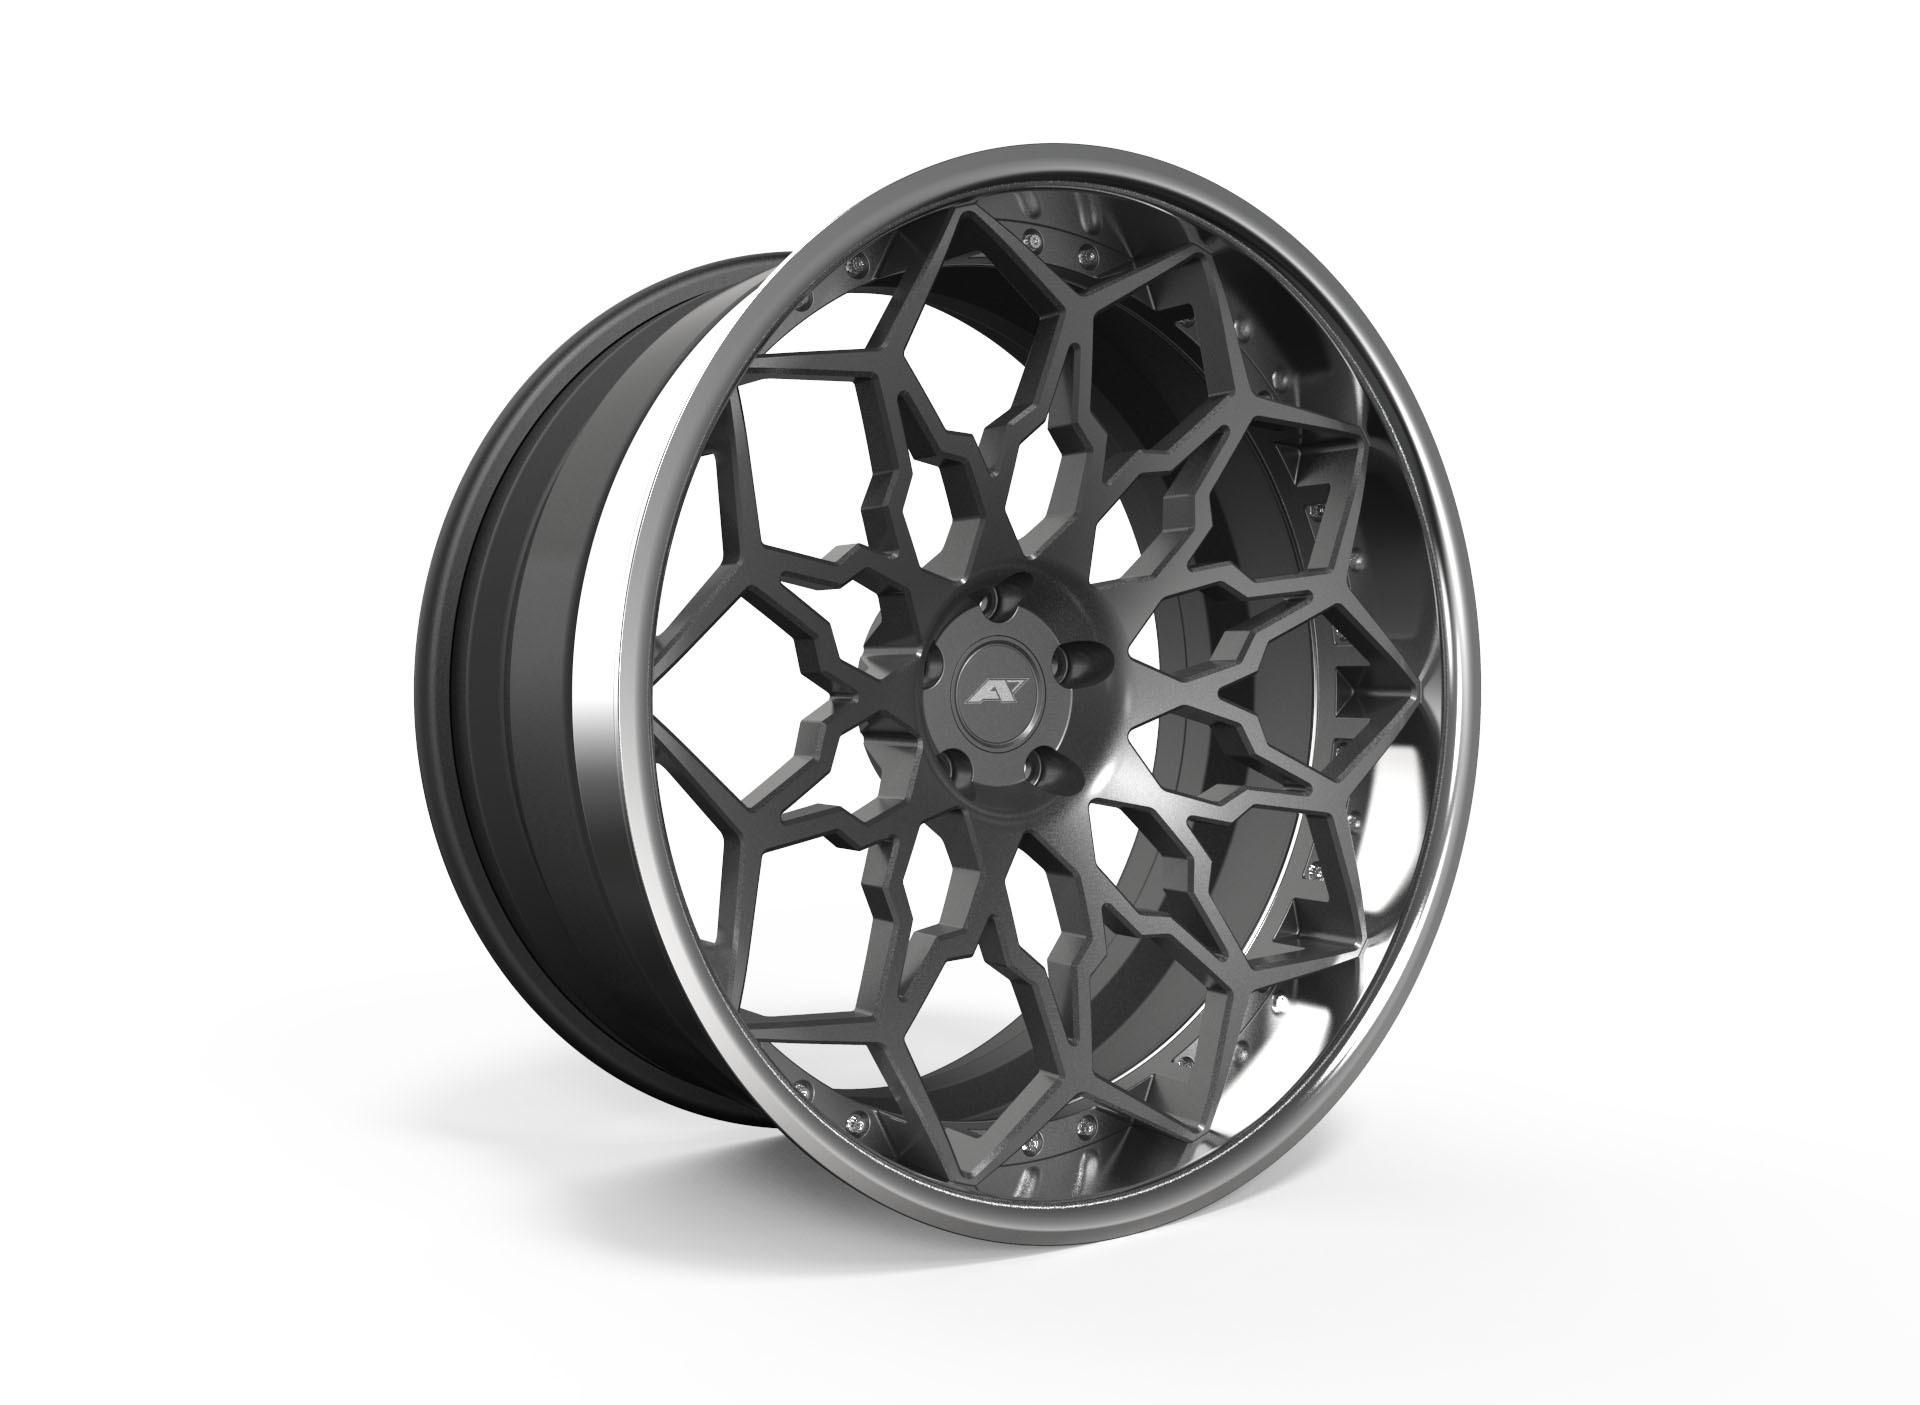 AMP Forged Wheels AMP 1010-3P FLAT LIP